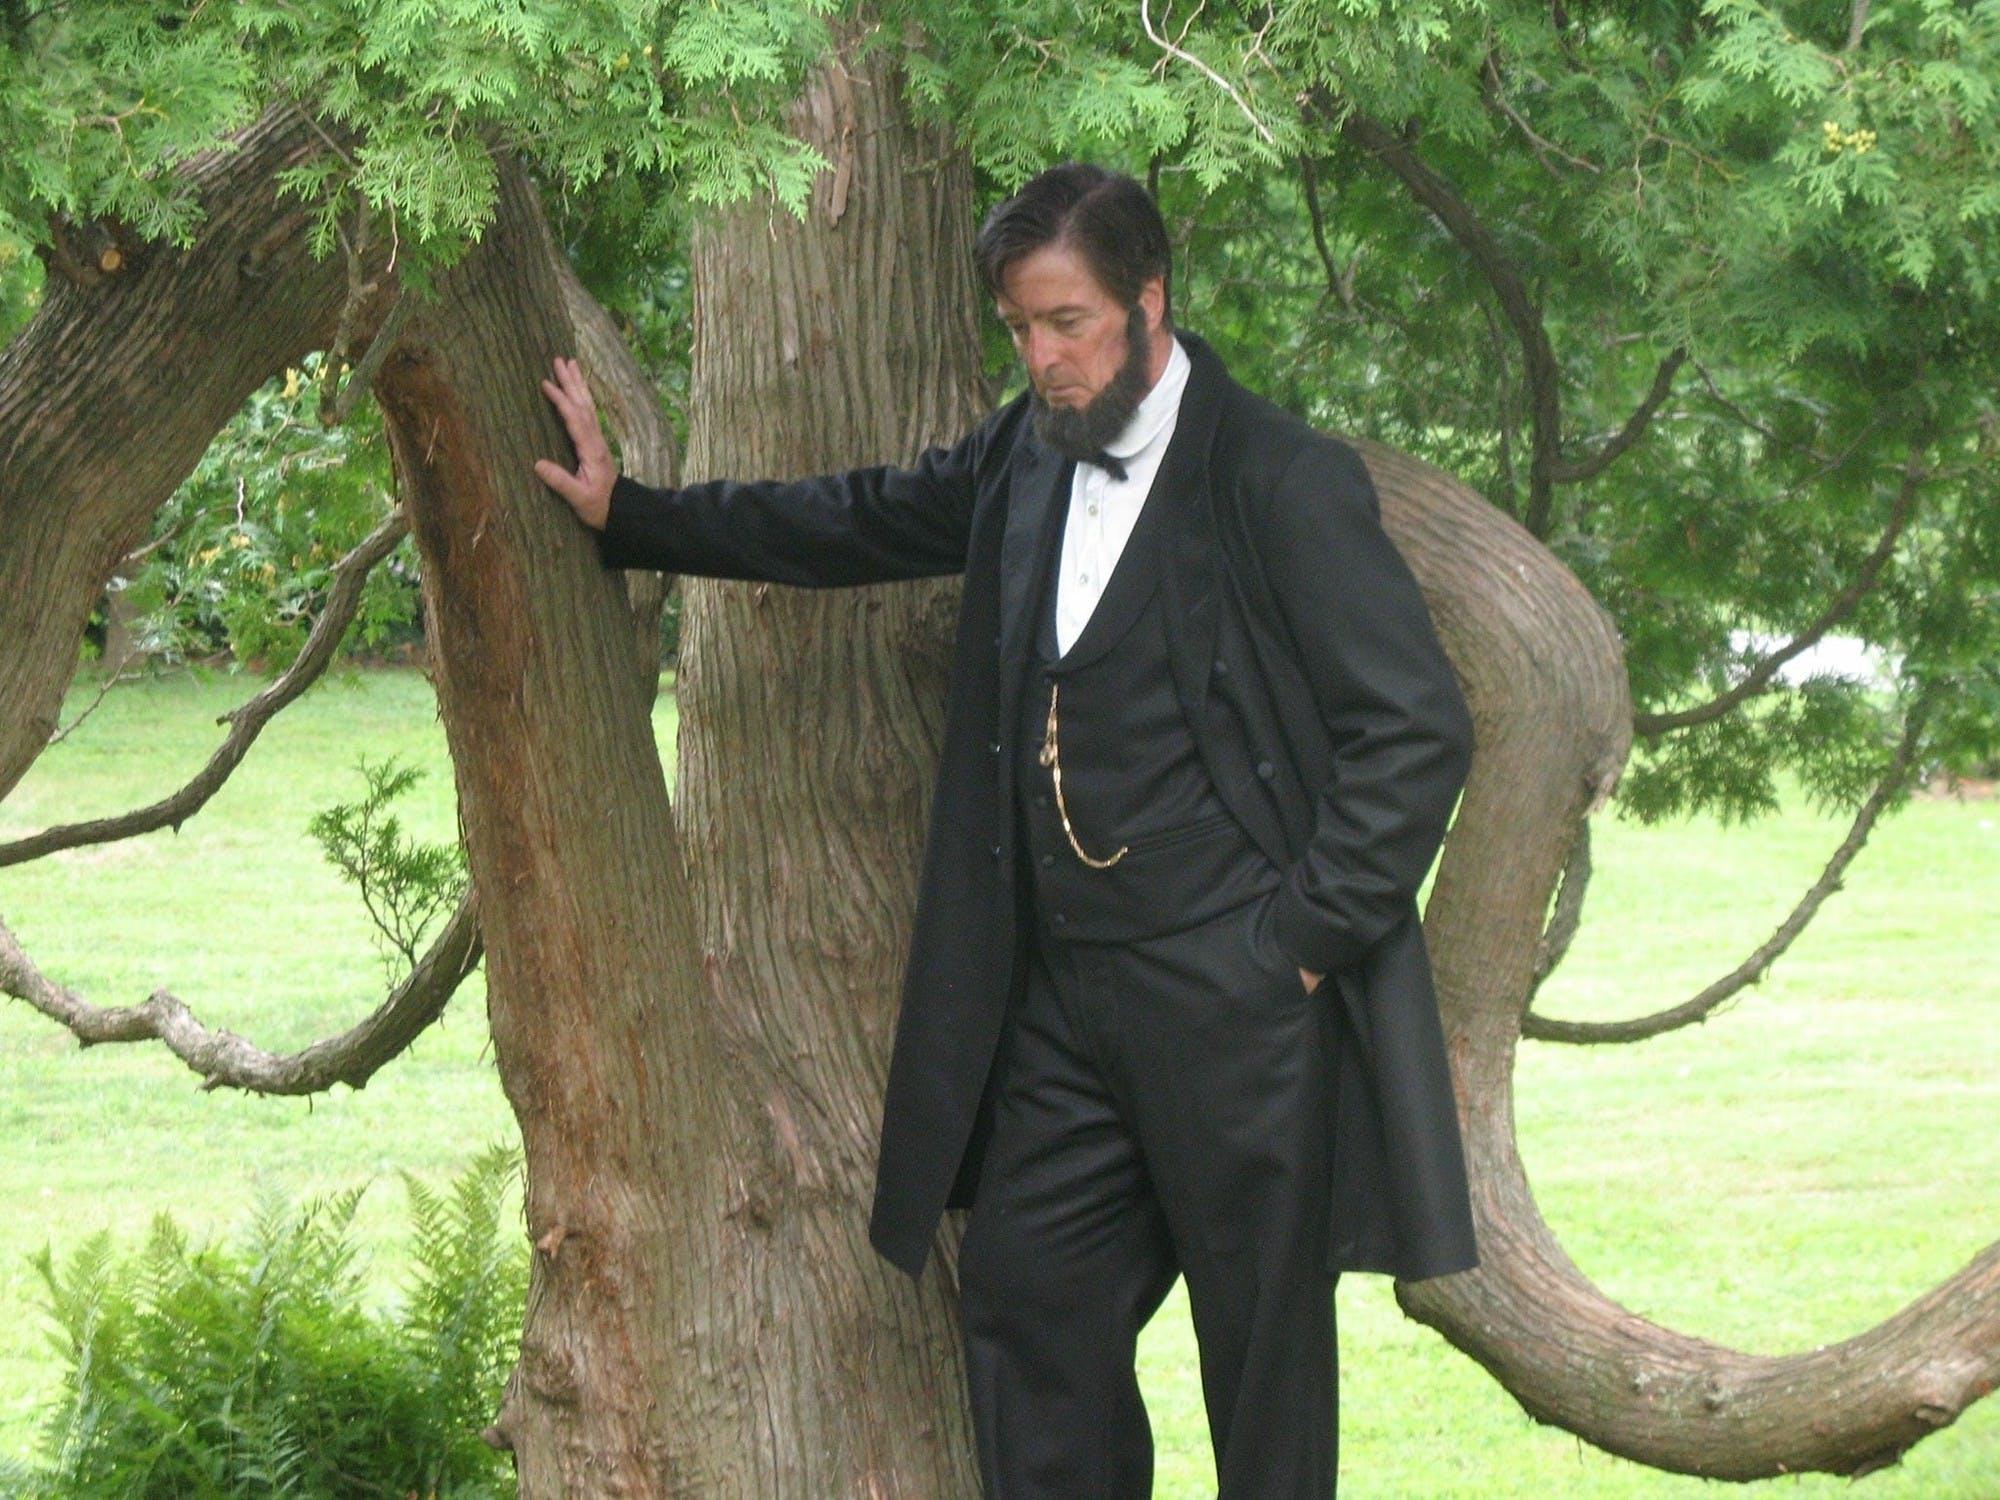 Lincoln portrayer Eric Richardson.